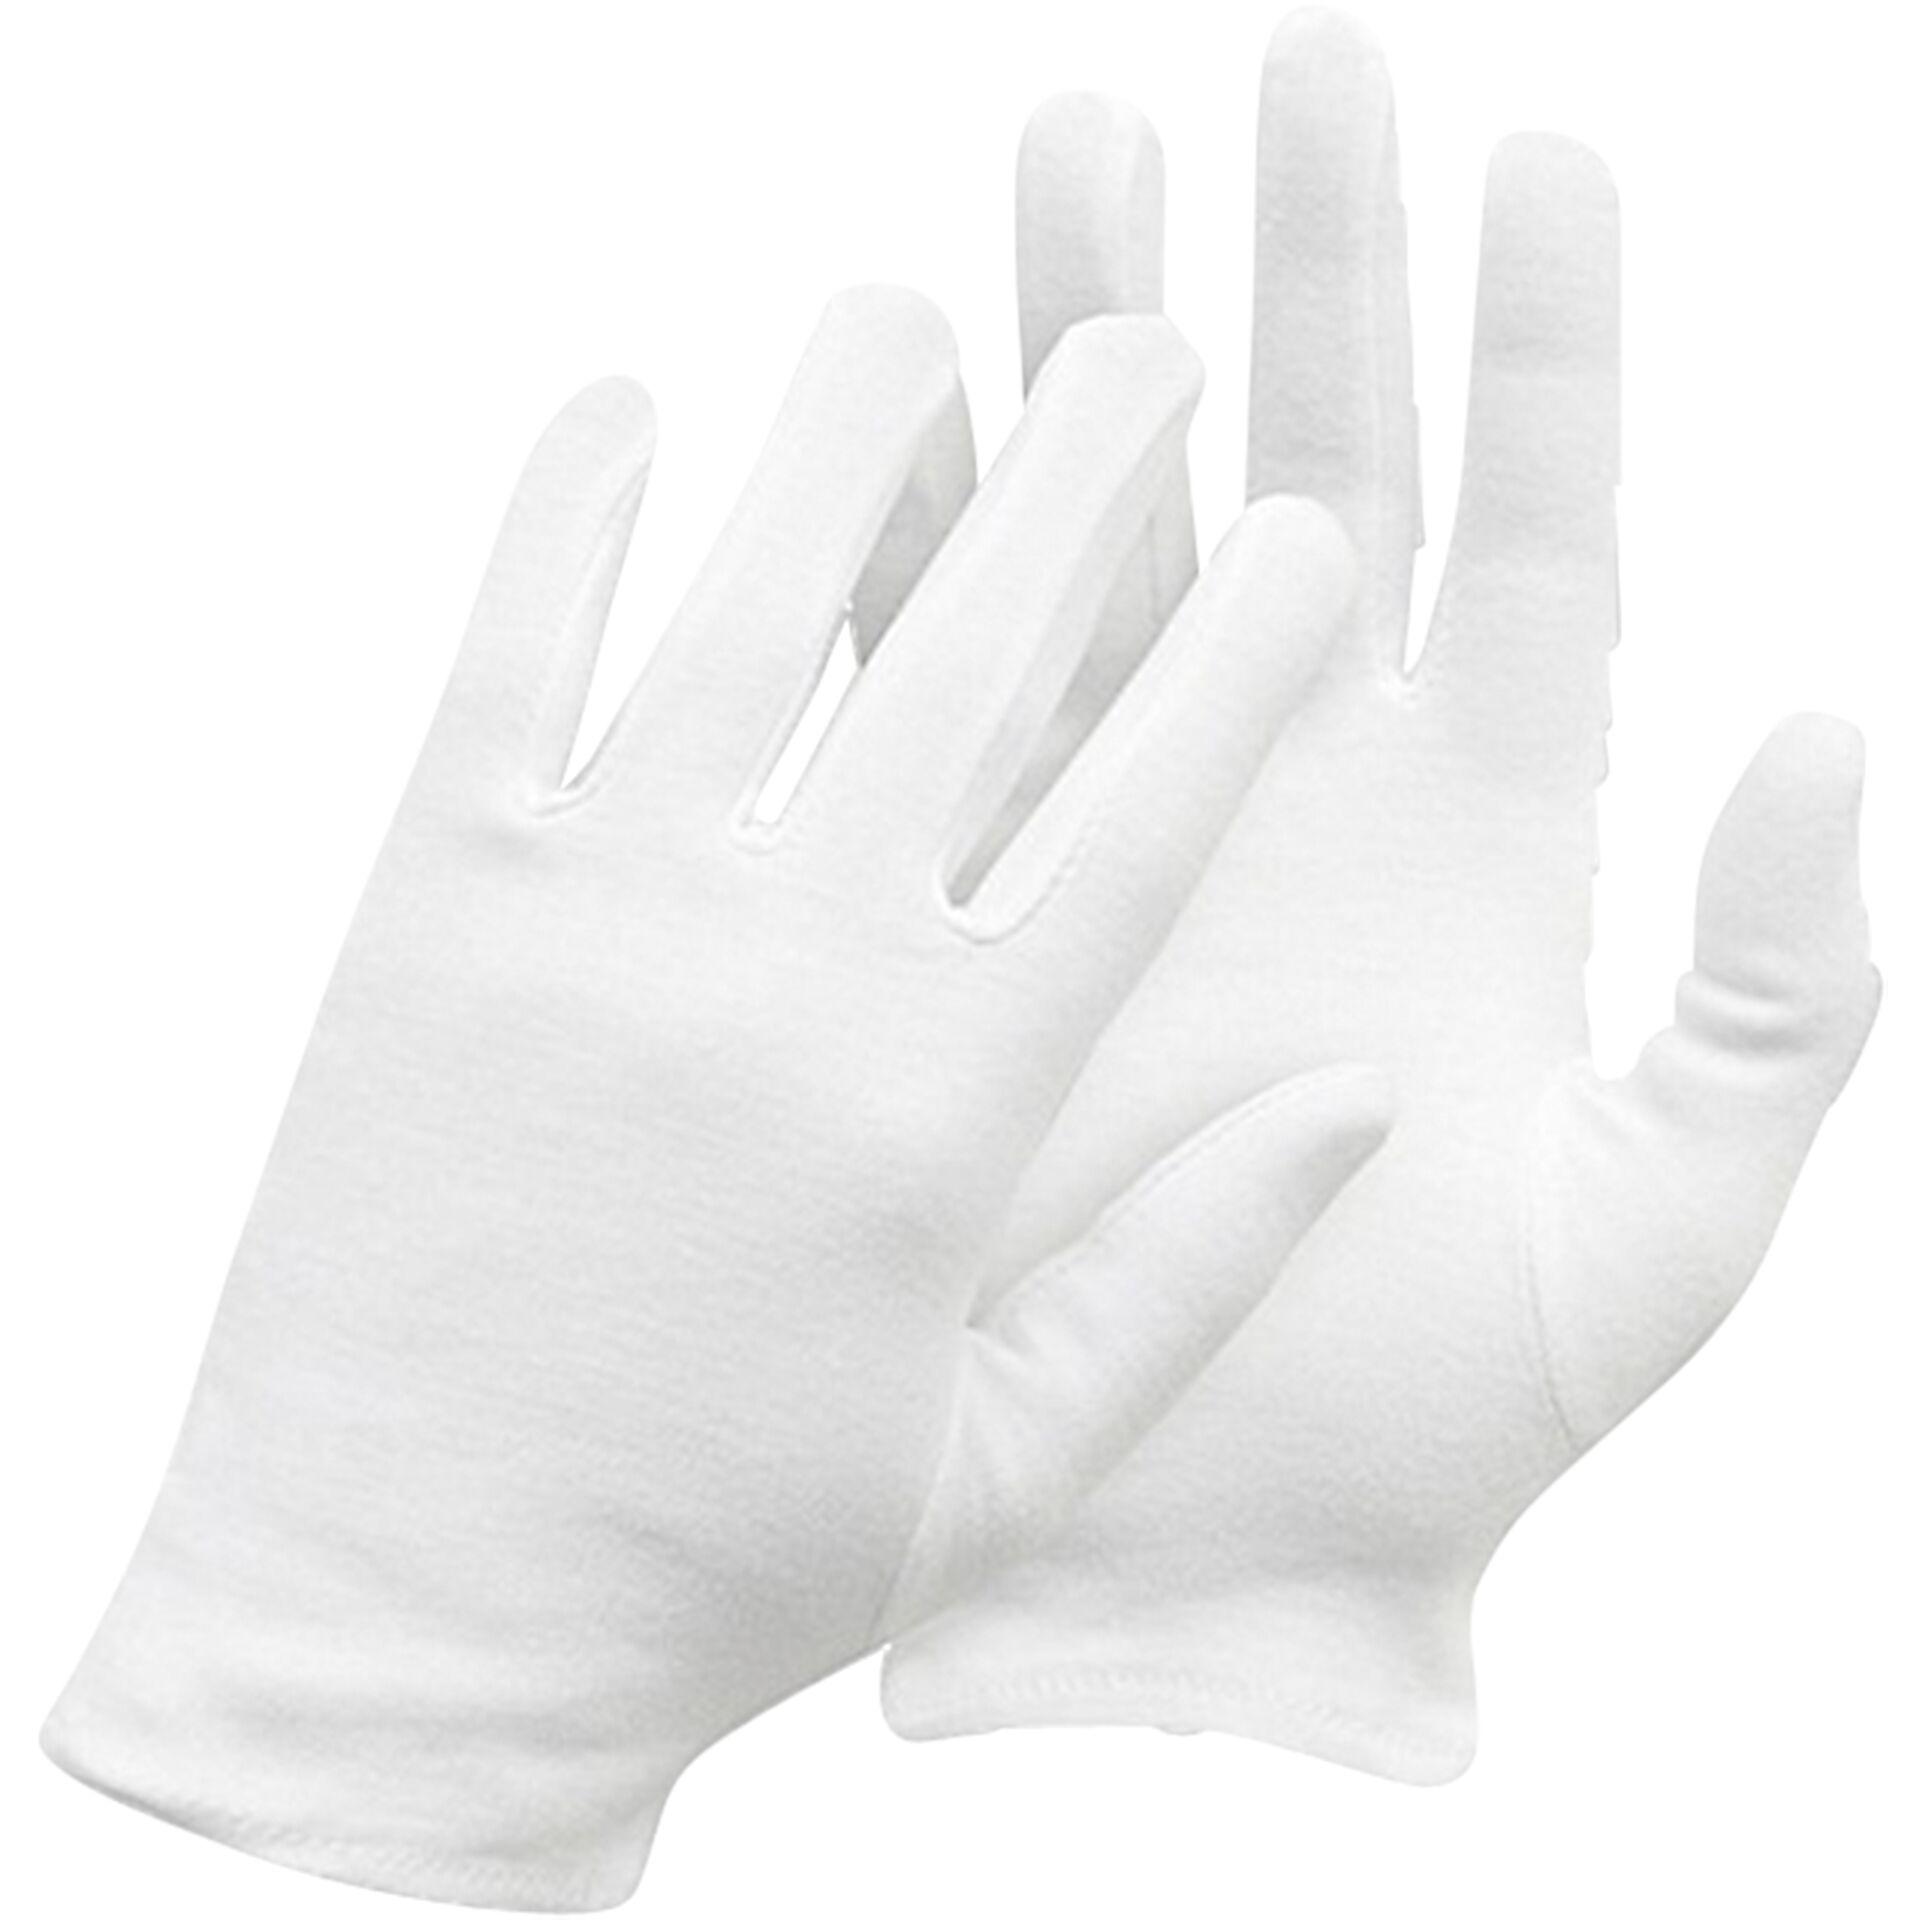 Reflecta Handschuhe Baumwolle